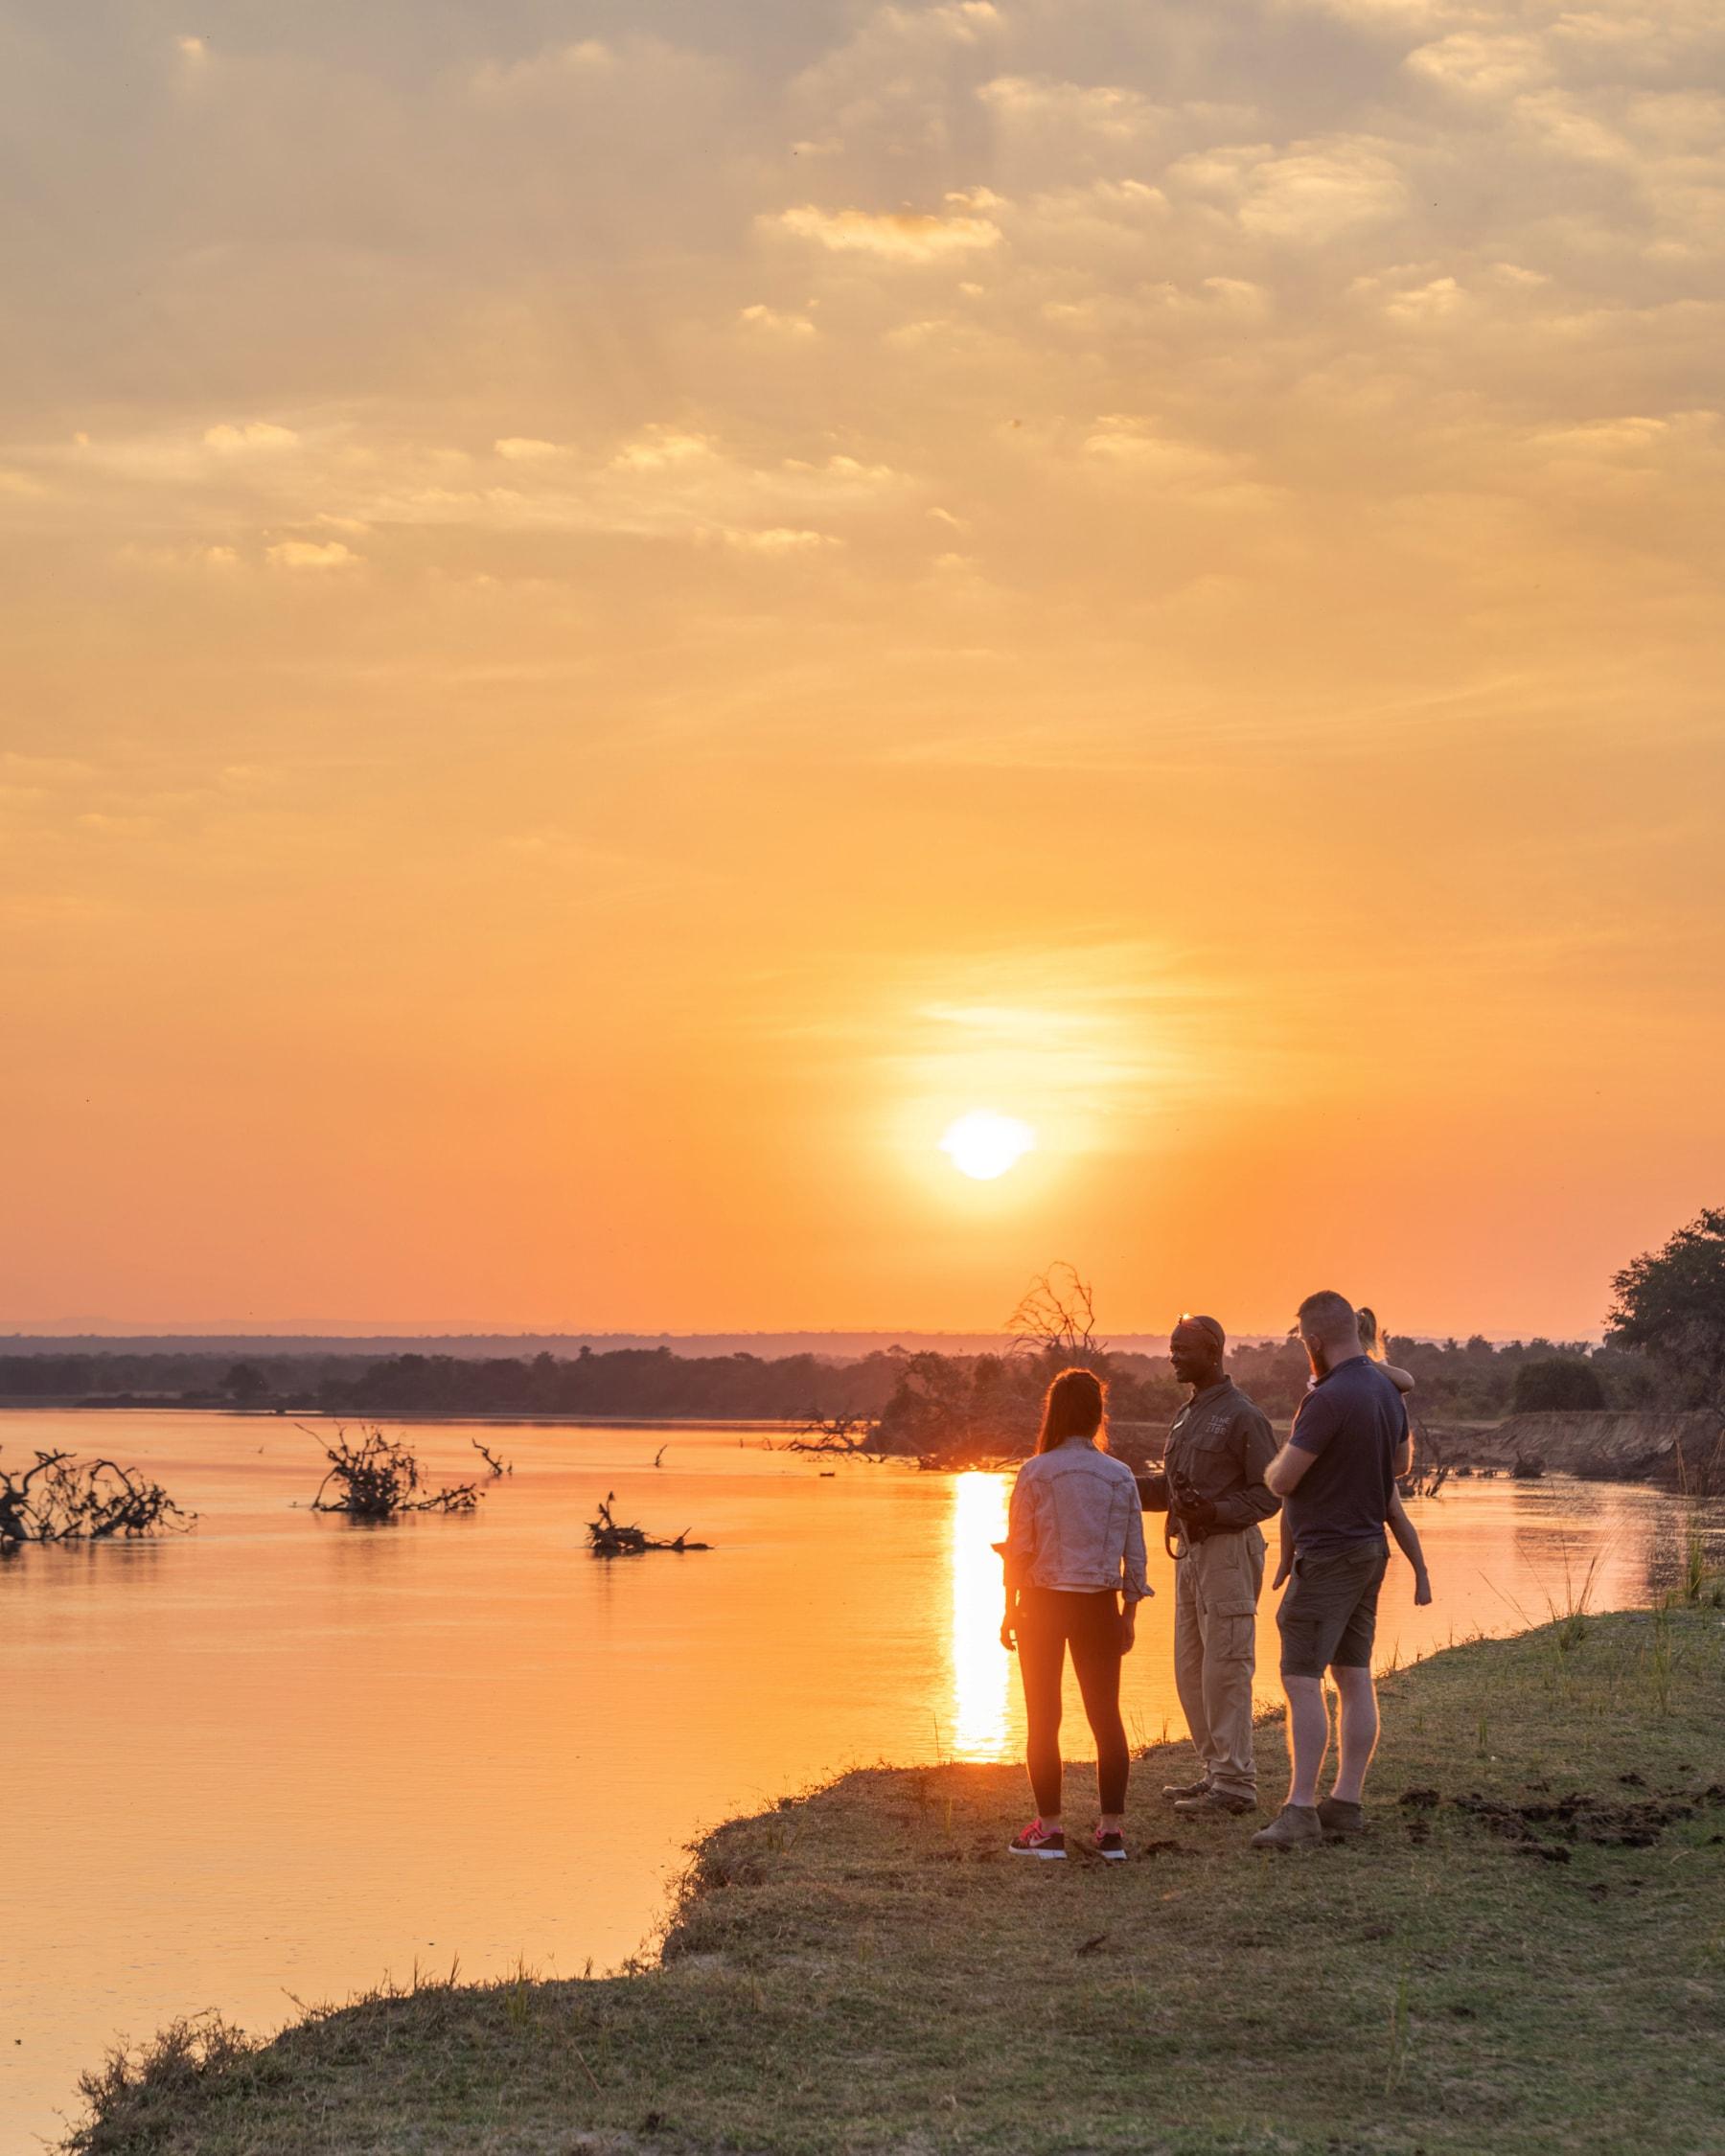 chinzombo-act-family-safari-activities